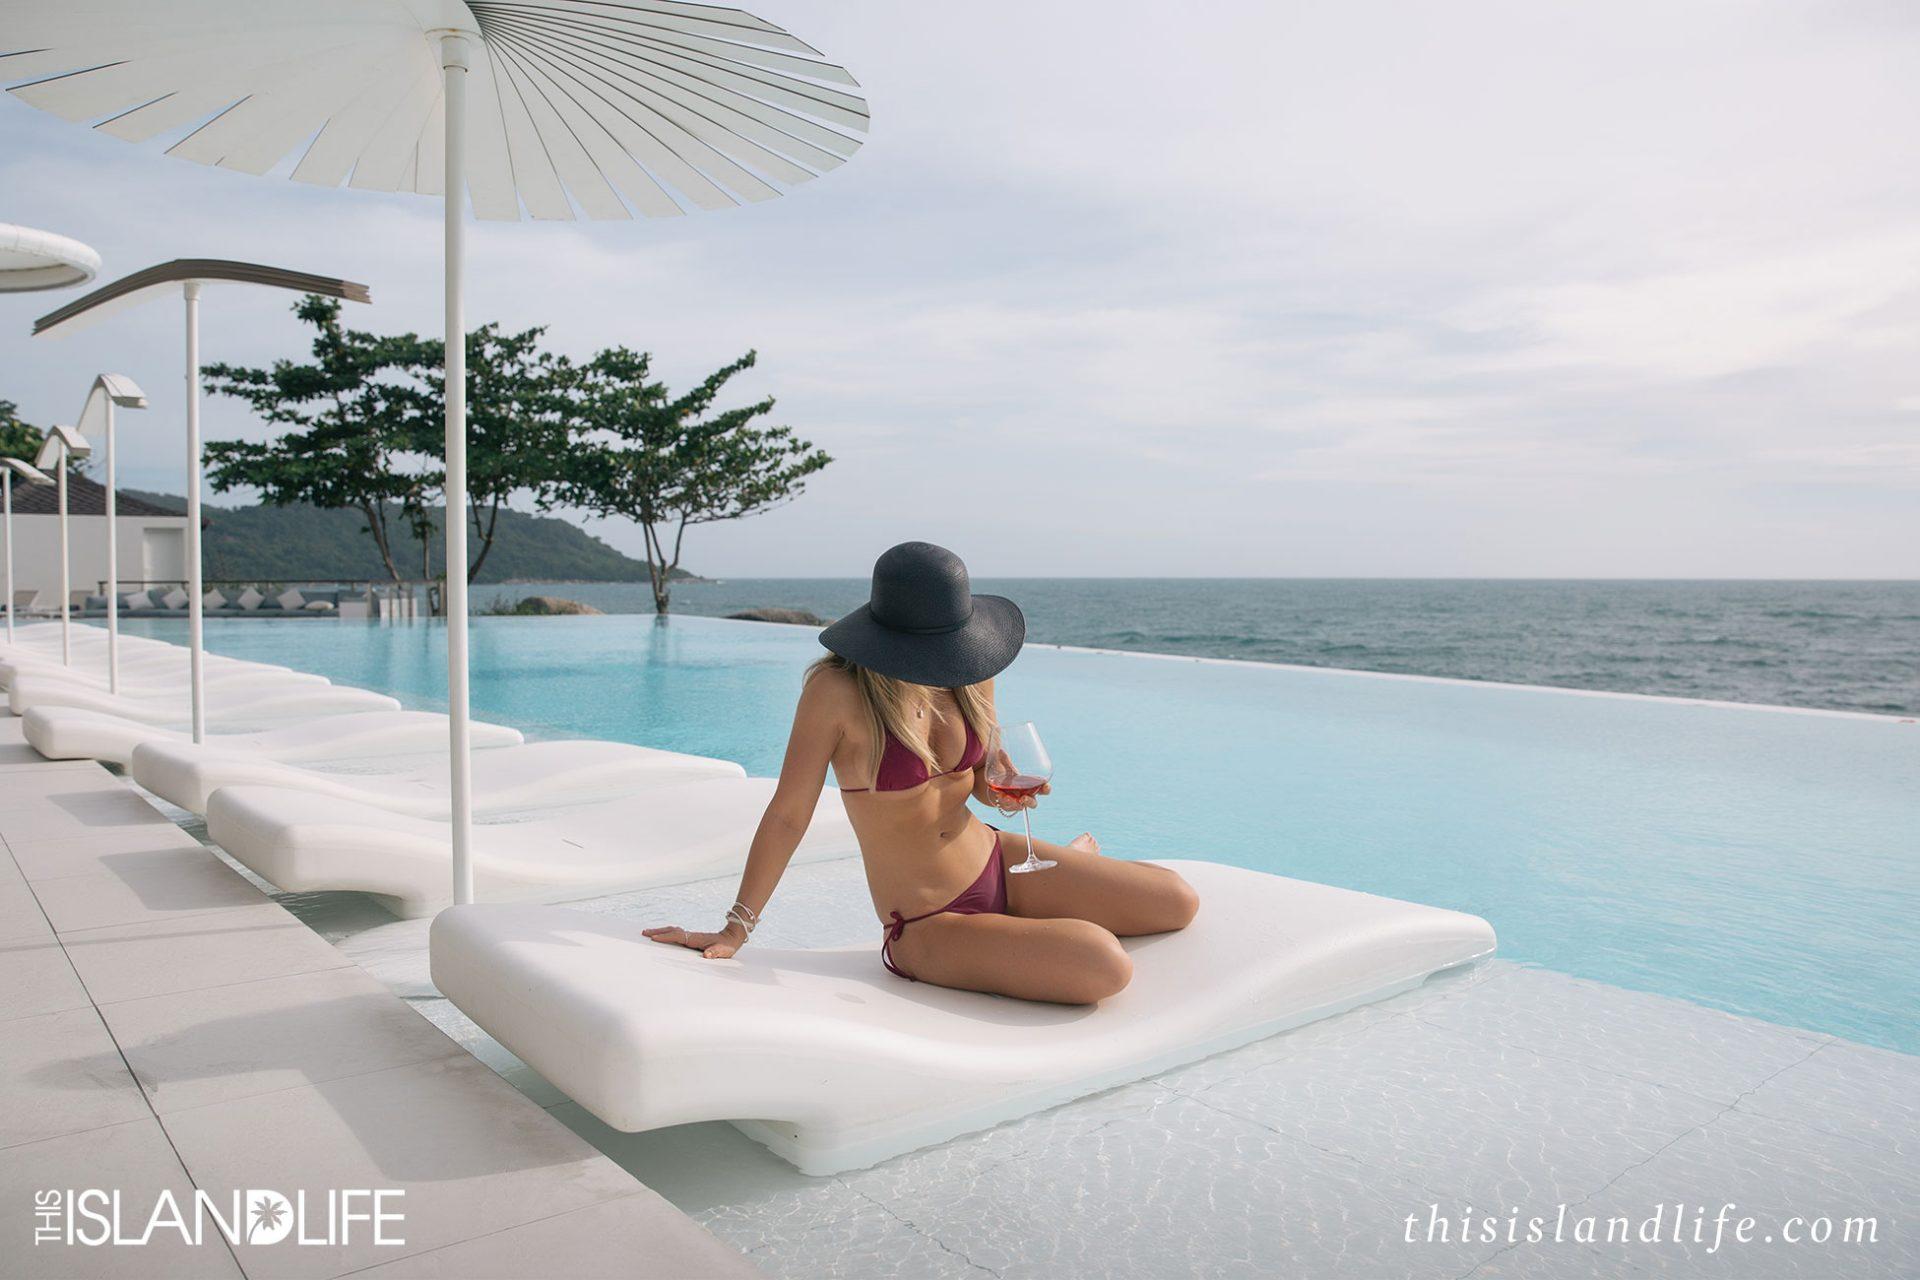 this-island-life-_-bangkok-_-phuket-_-kata-rocks-_-1-wm